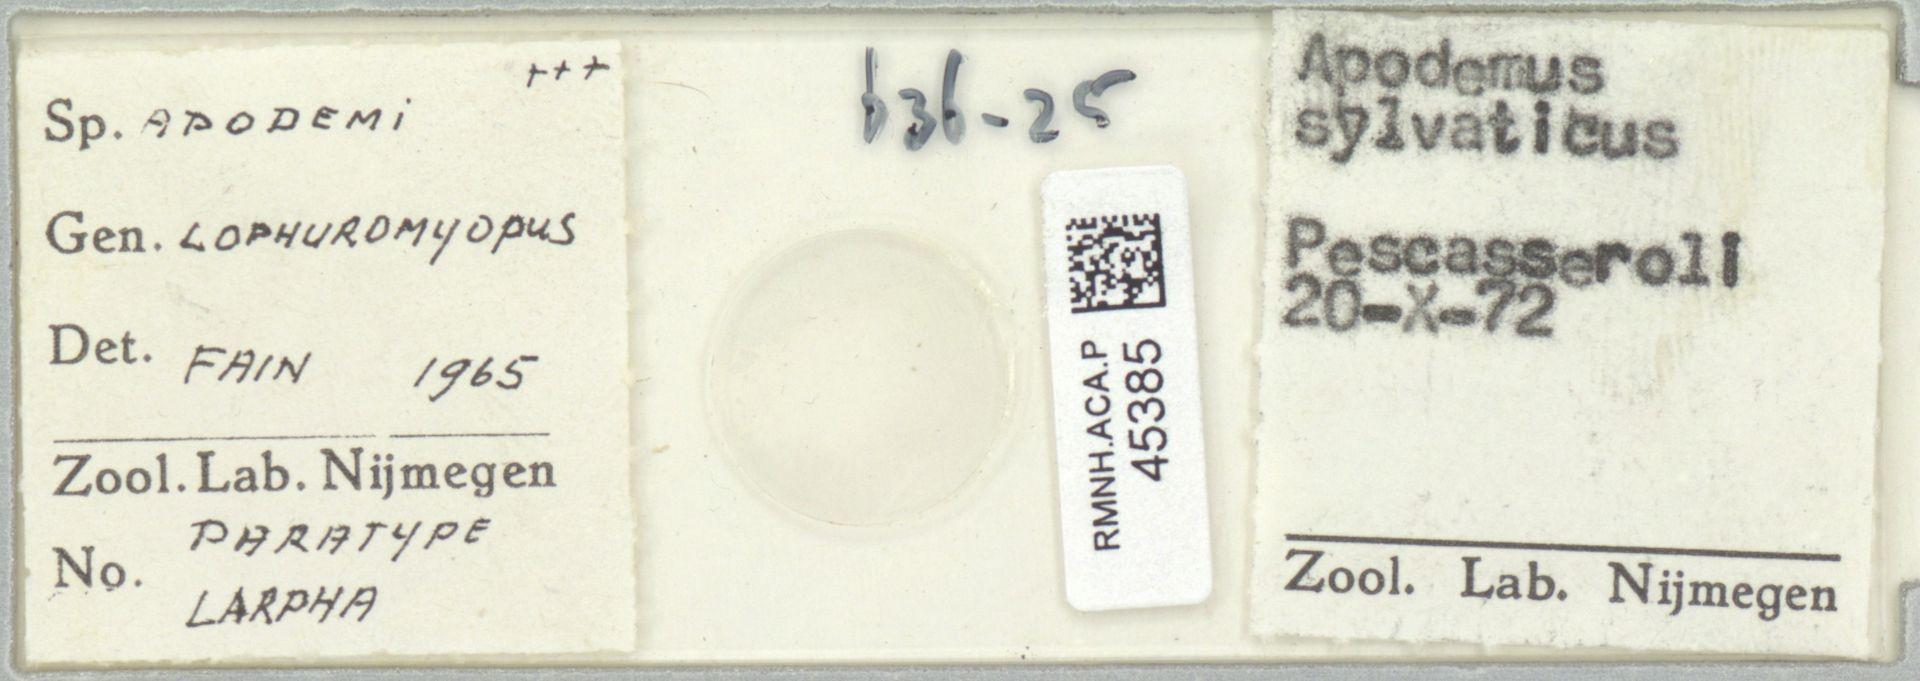 RMNH.ACA.P.45385 | Lophuromyopus apodemi Fain 1965